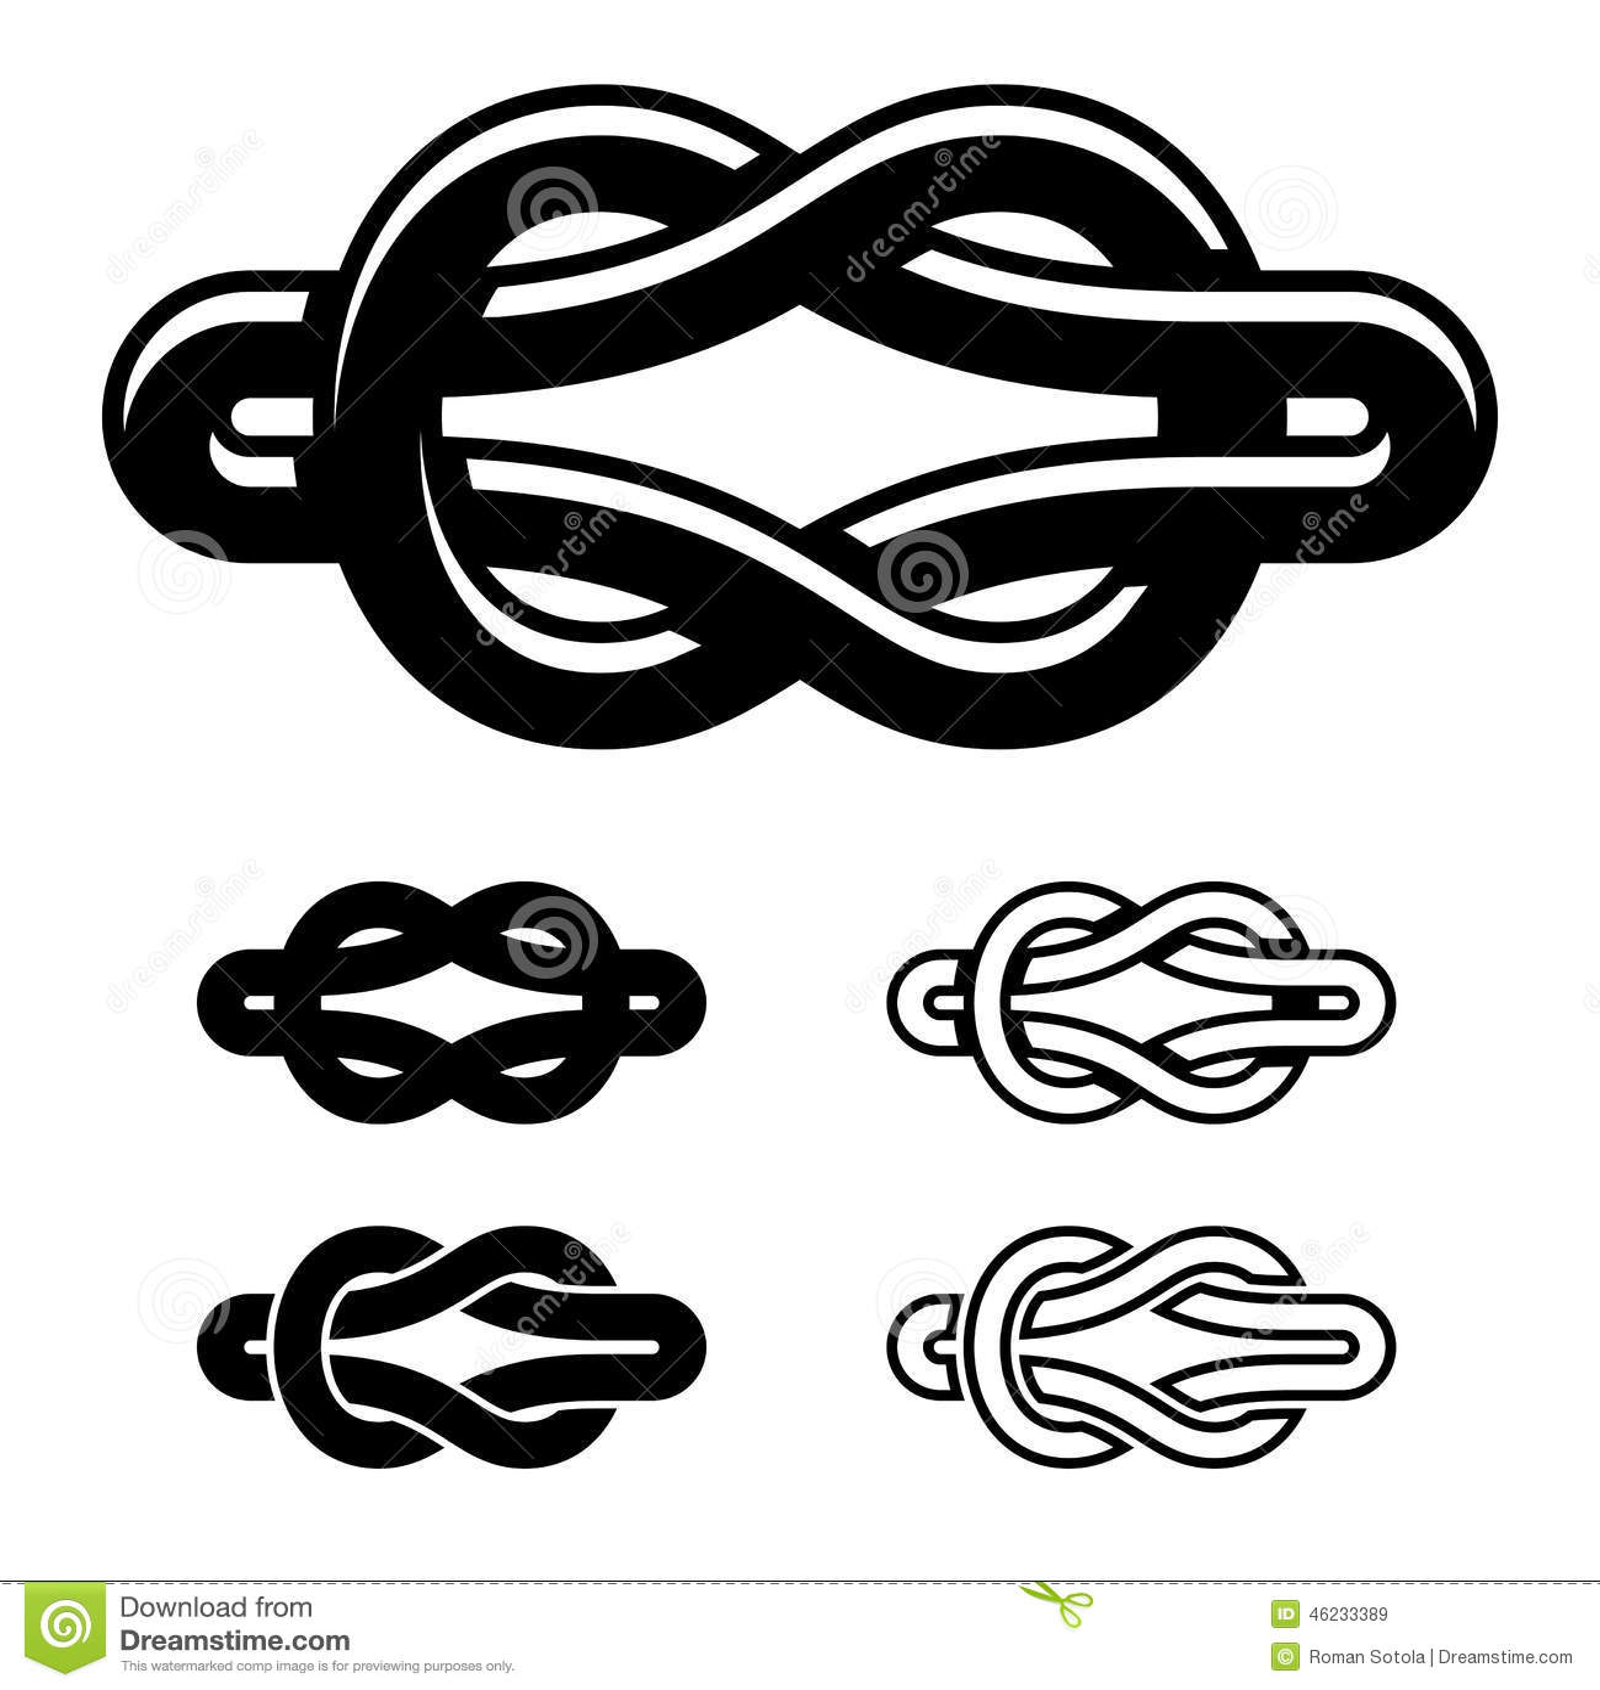 Unity Knot Black White Symbols Stock Vector - Image: 46233389